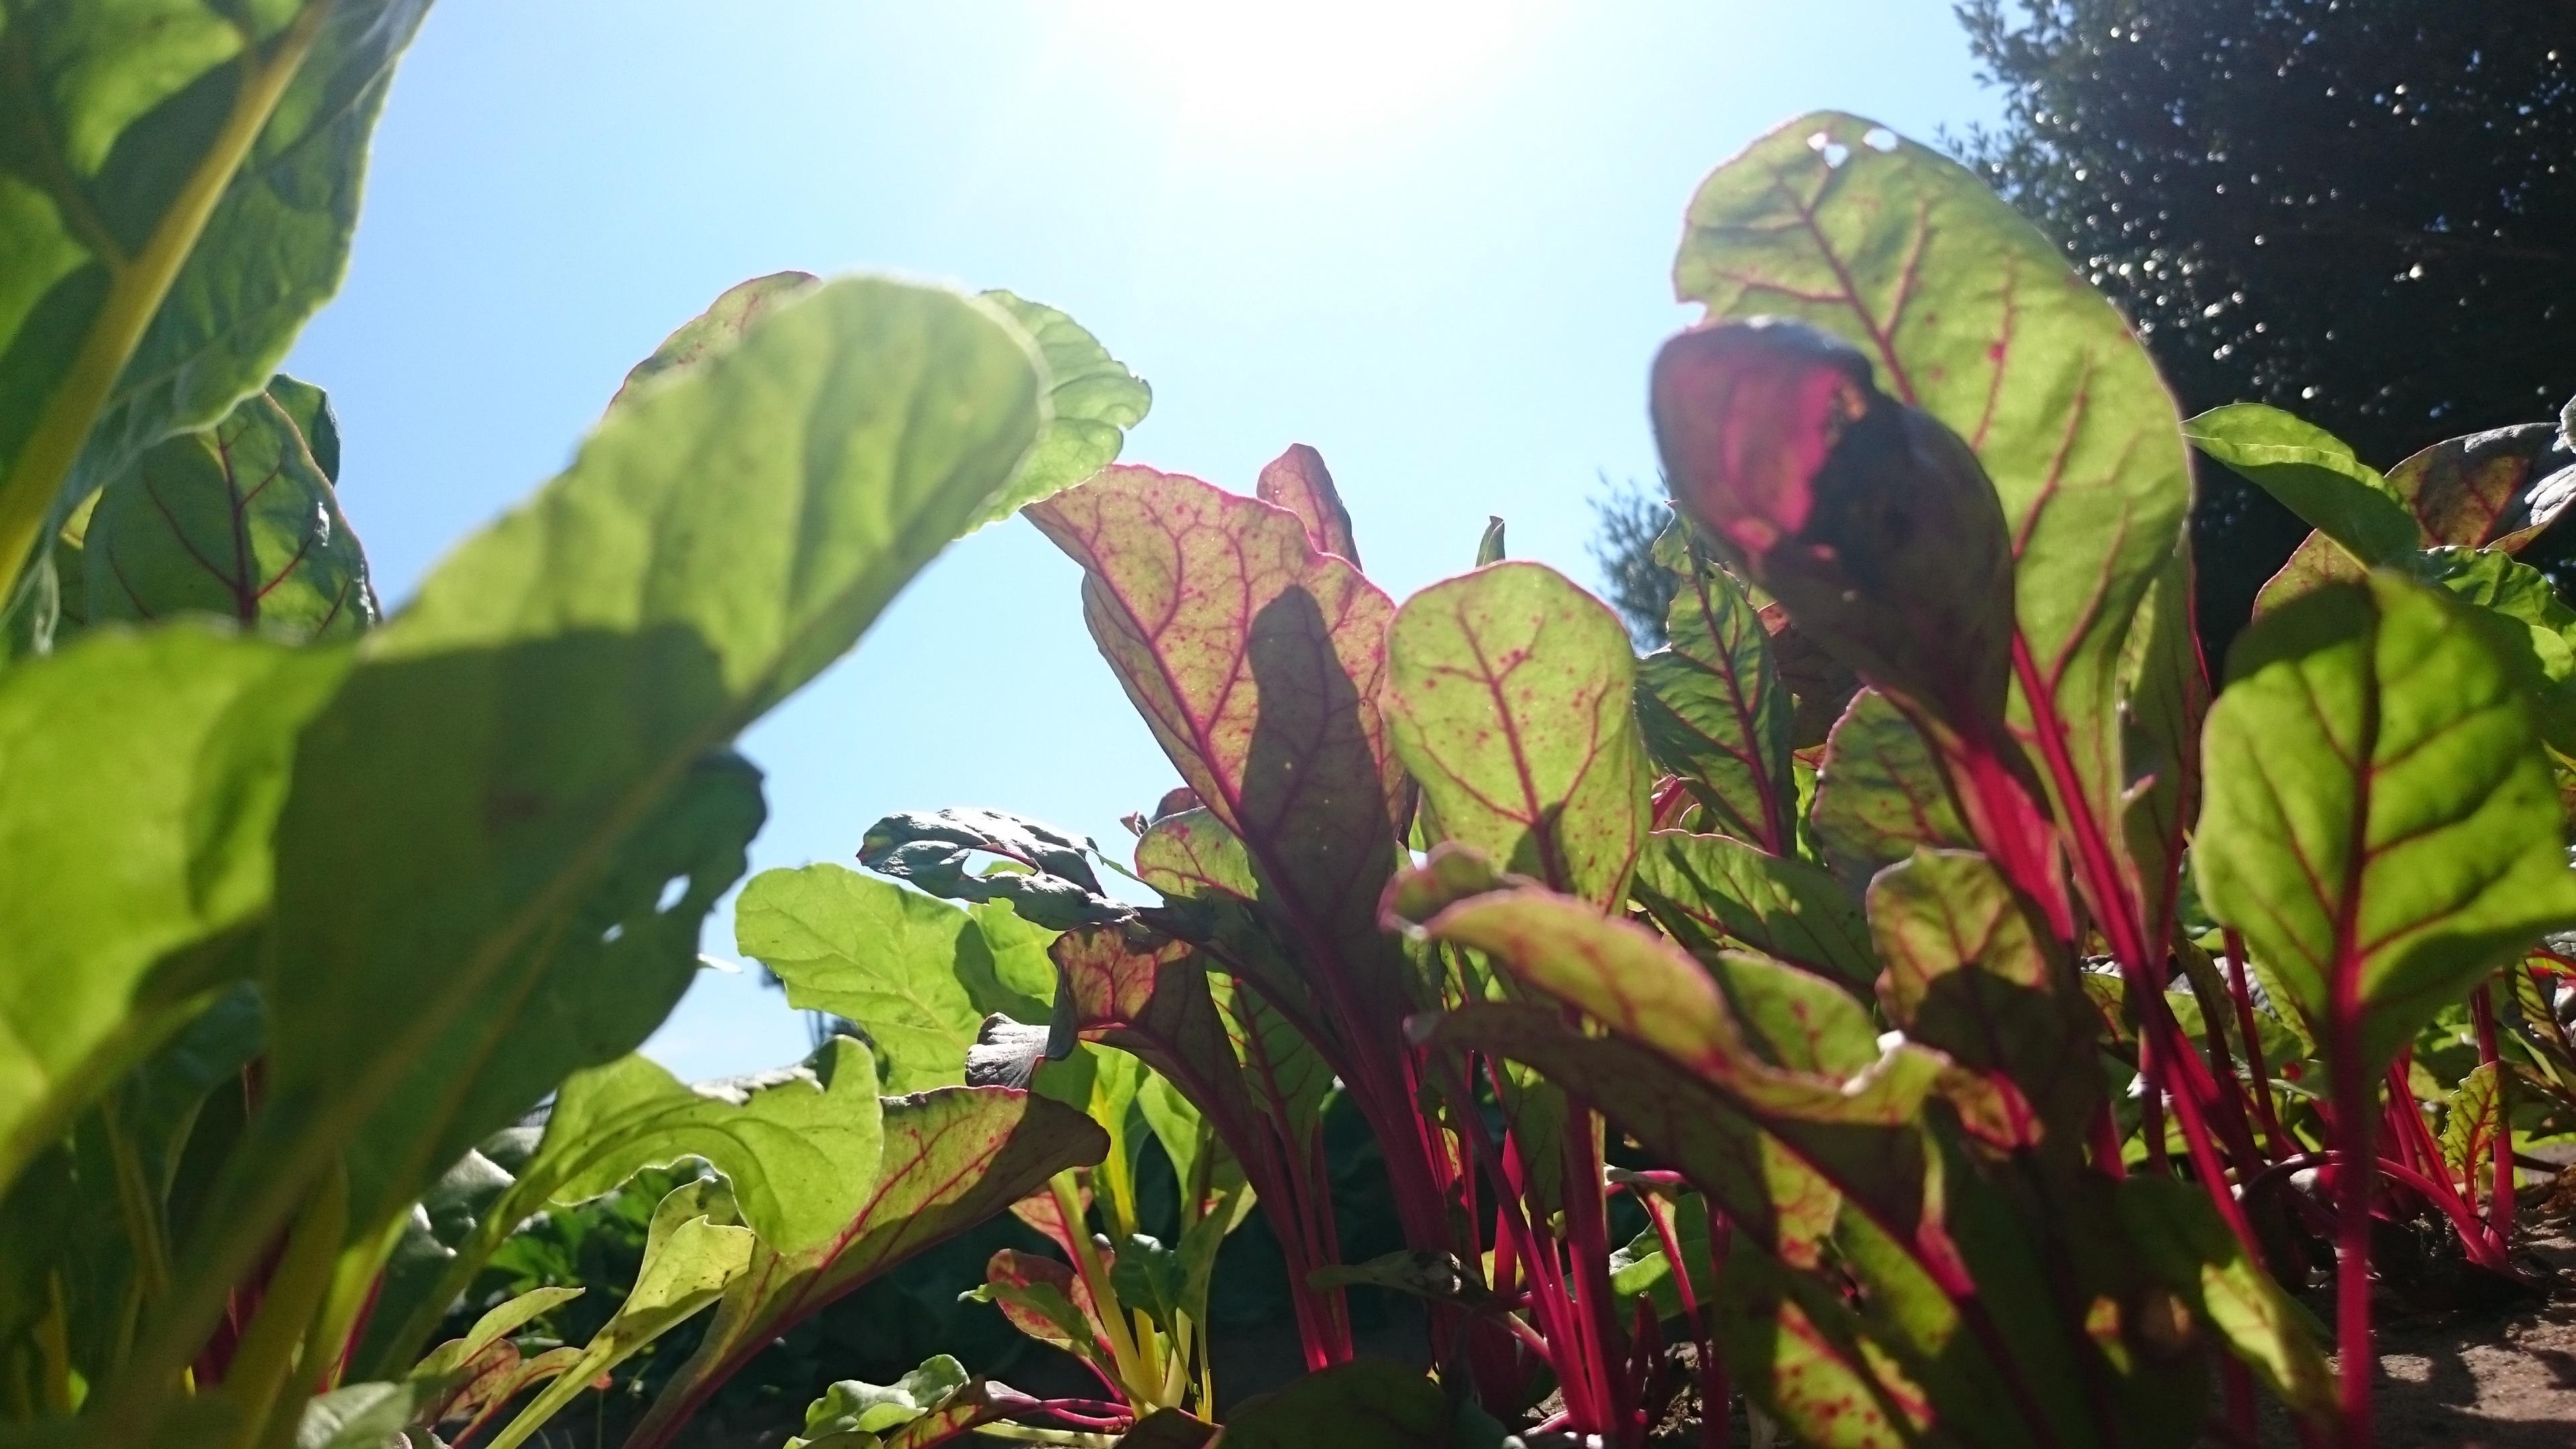 fe1eb16bf5 なかの農園の紹介:石川県 食べチョク 農家直送・安心・新鮮な有機野菜のネット通販